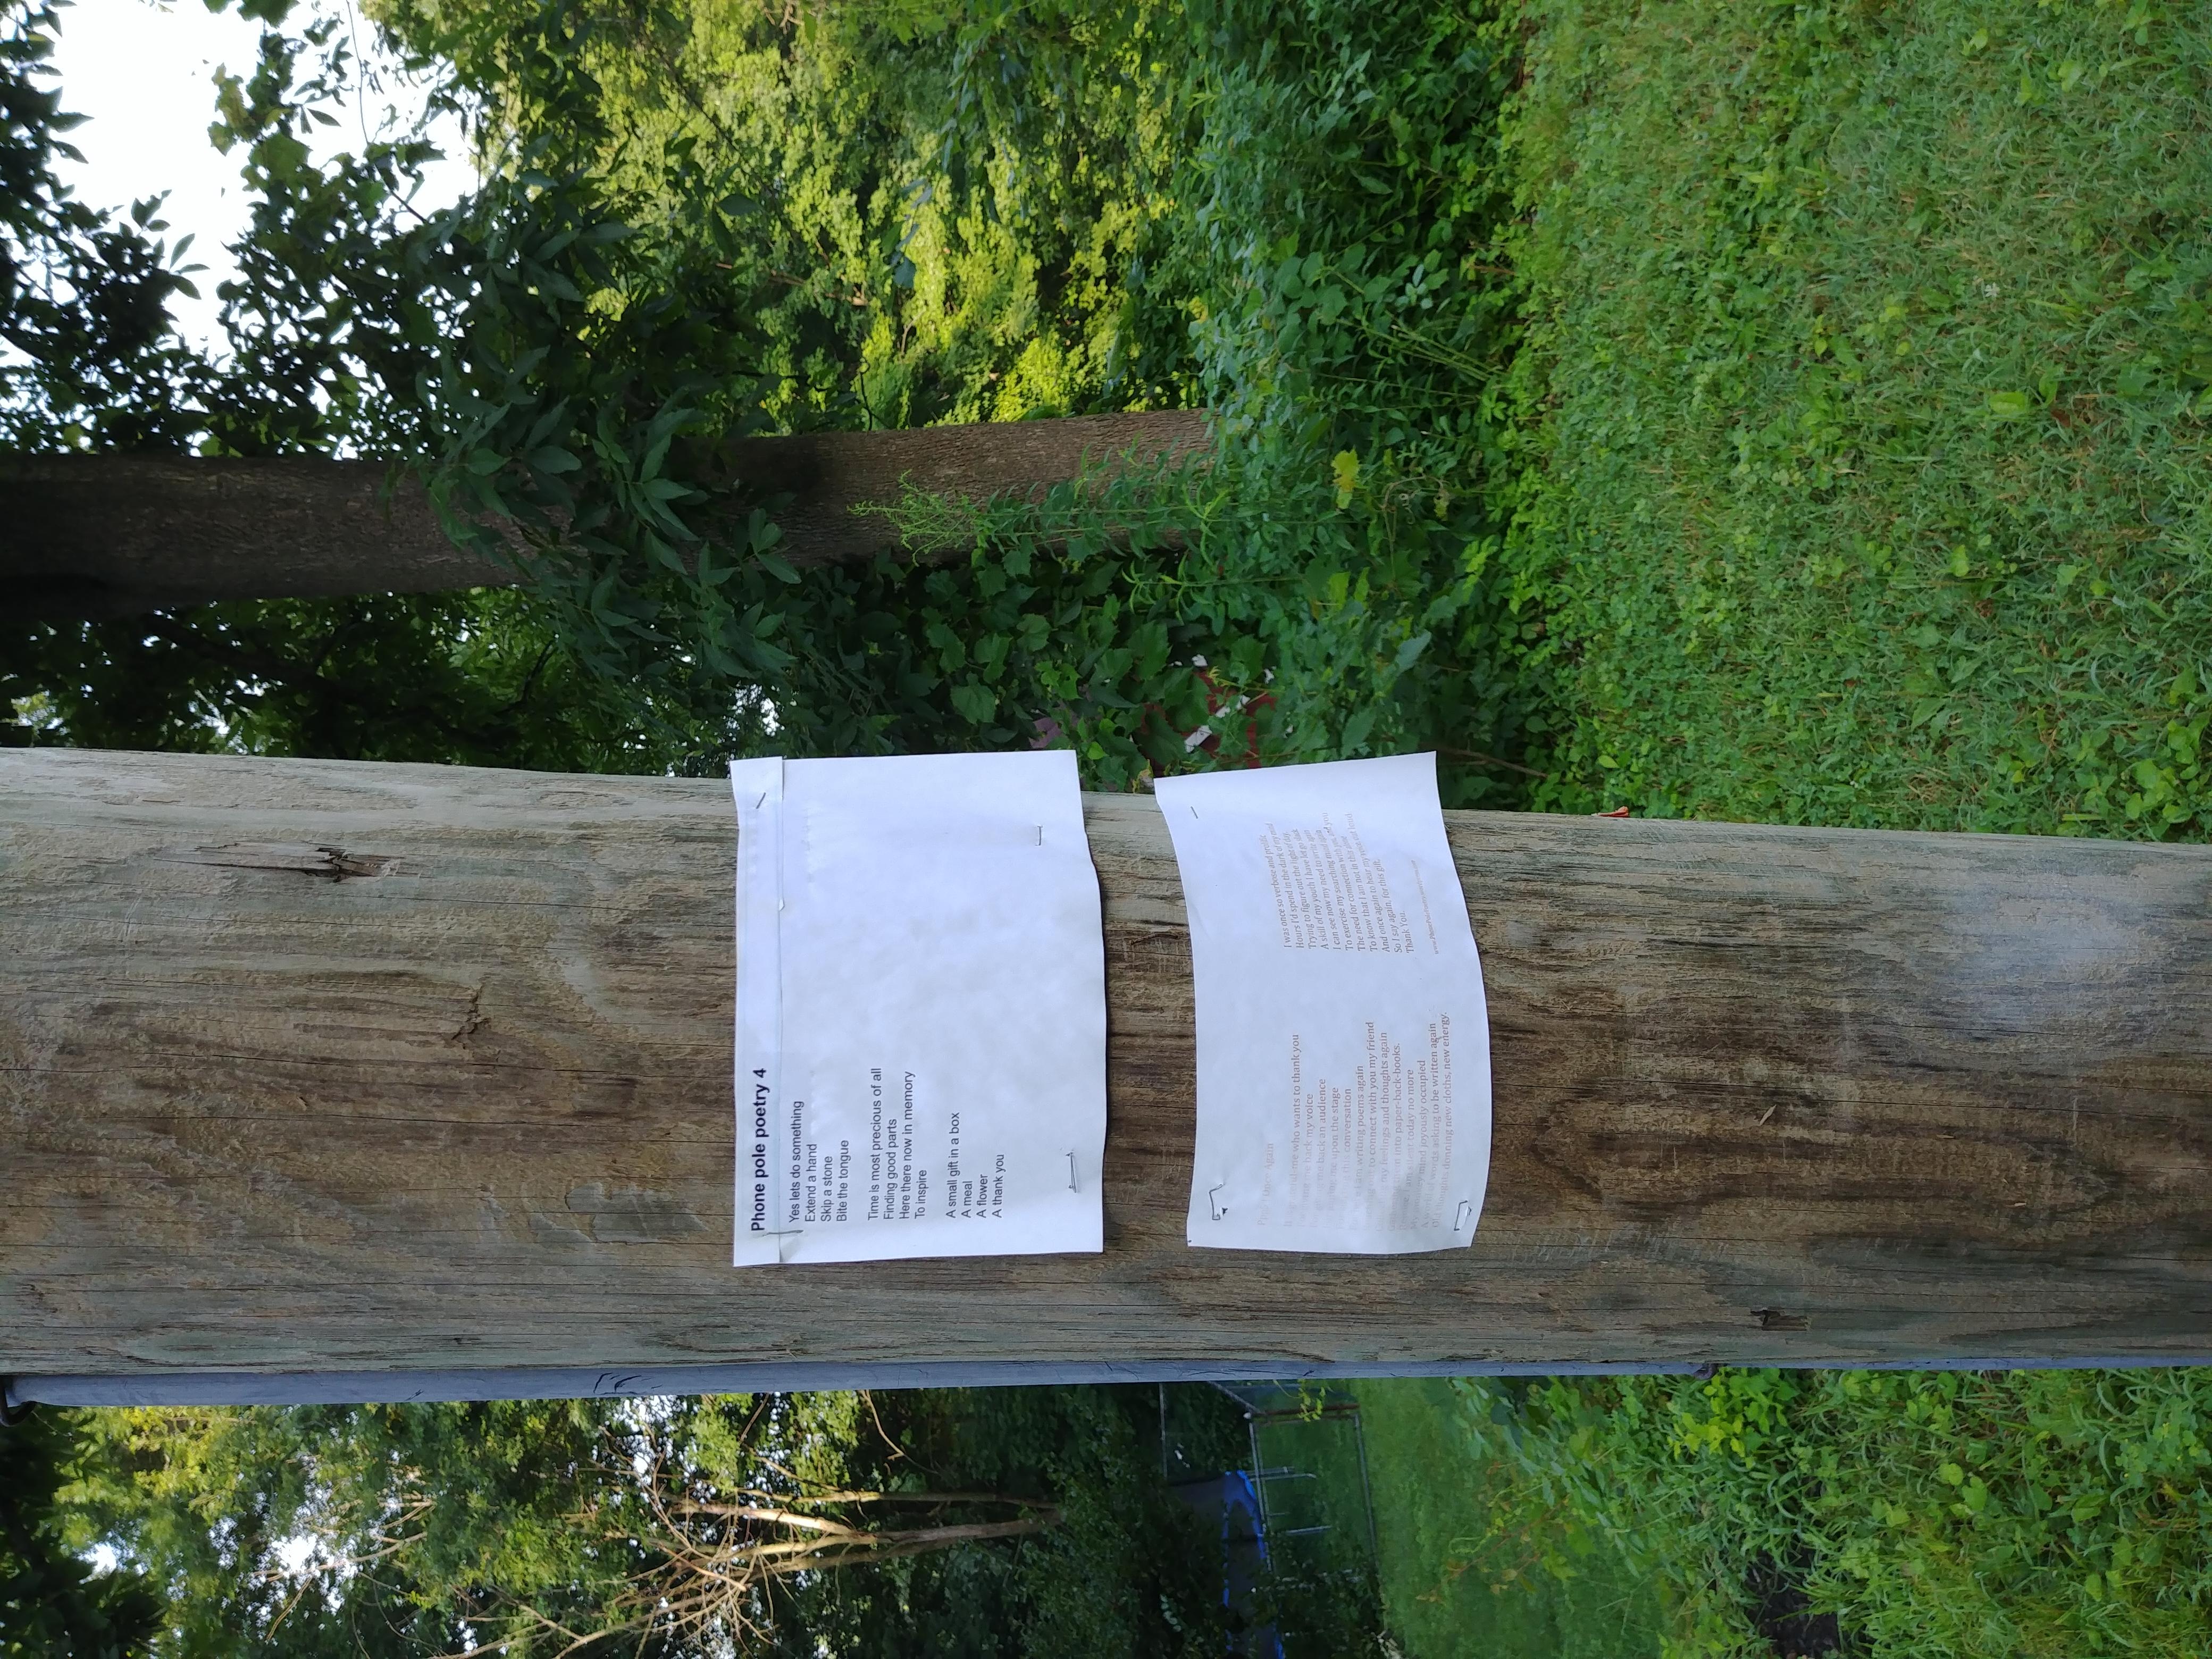 Phone Pole Poems 4 & 5